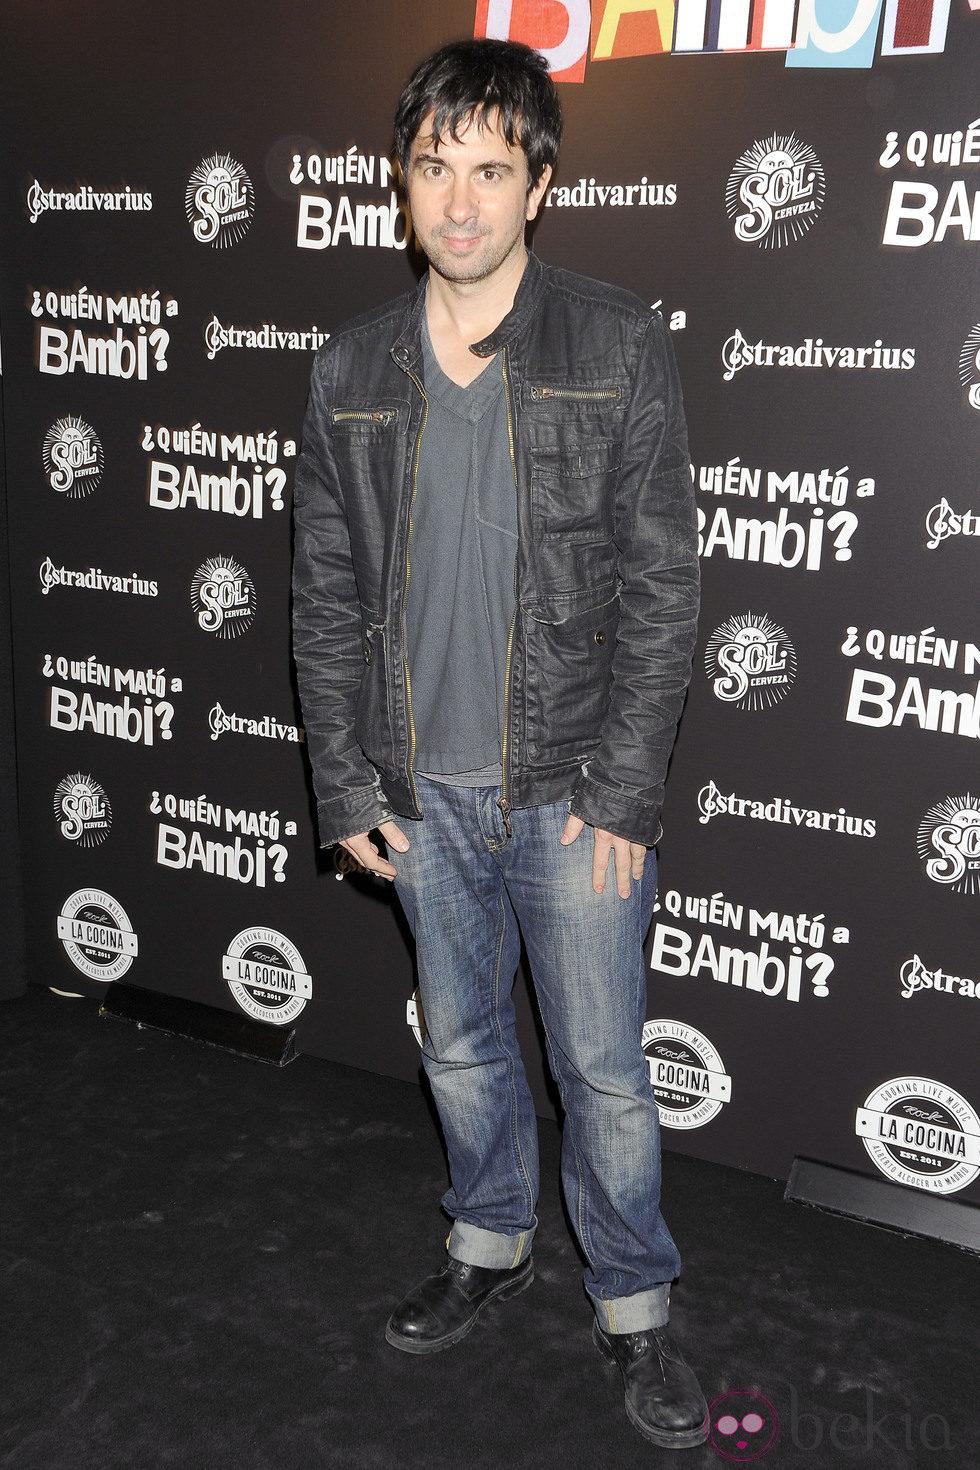 Eduardo Chapero-Jackson en el estreno de '¿Quién mató a Bambi?' en Madrid